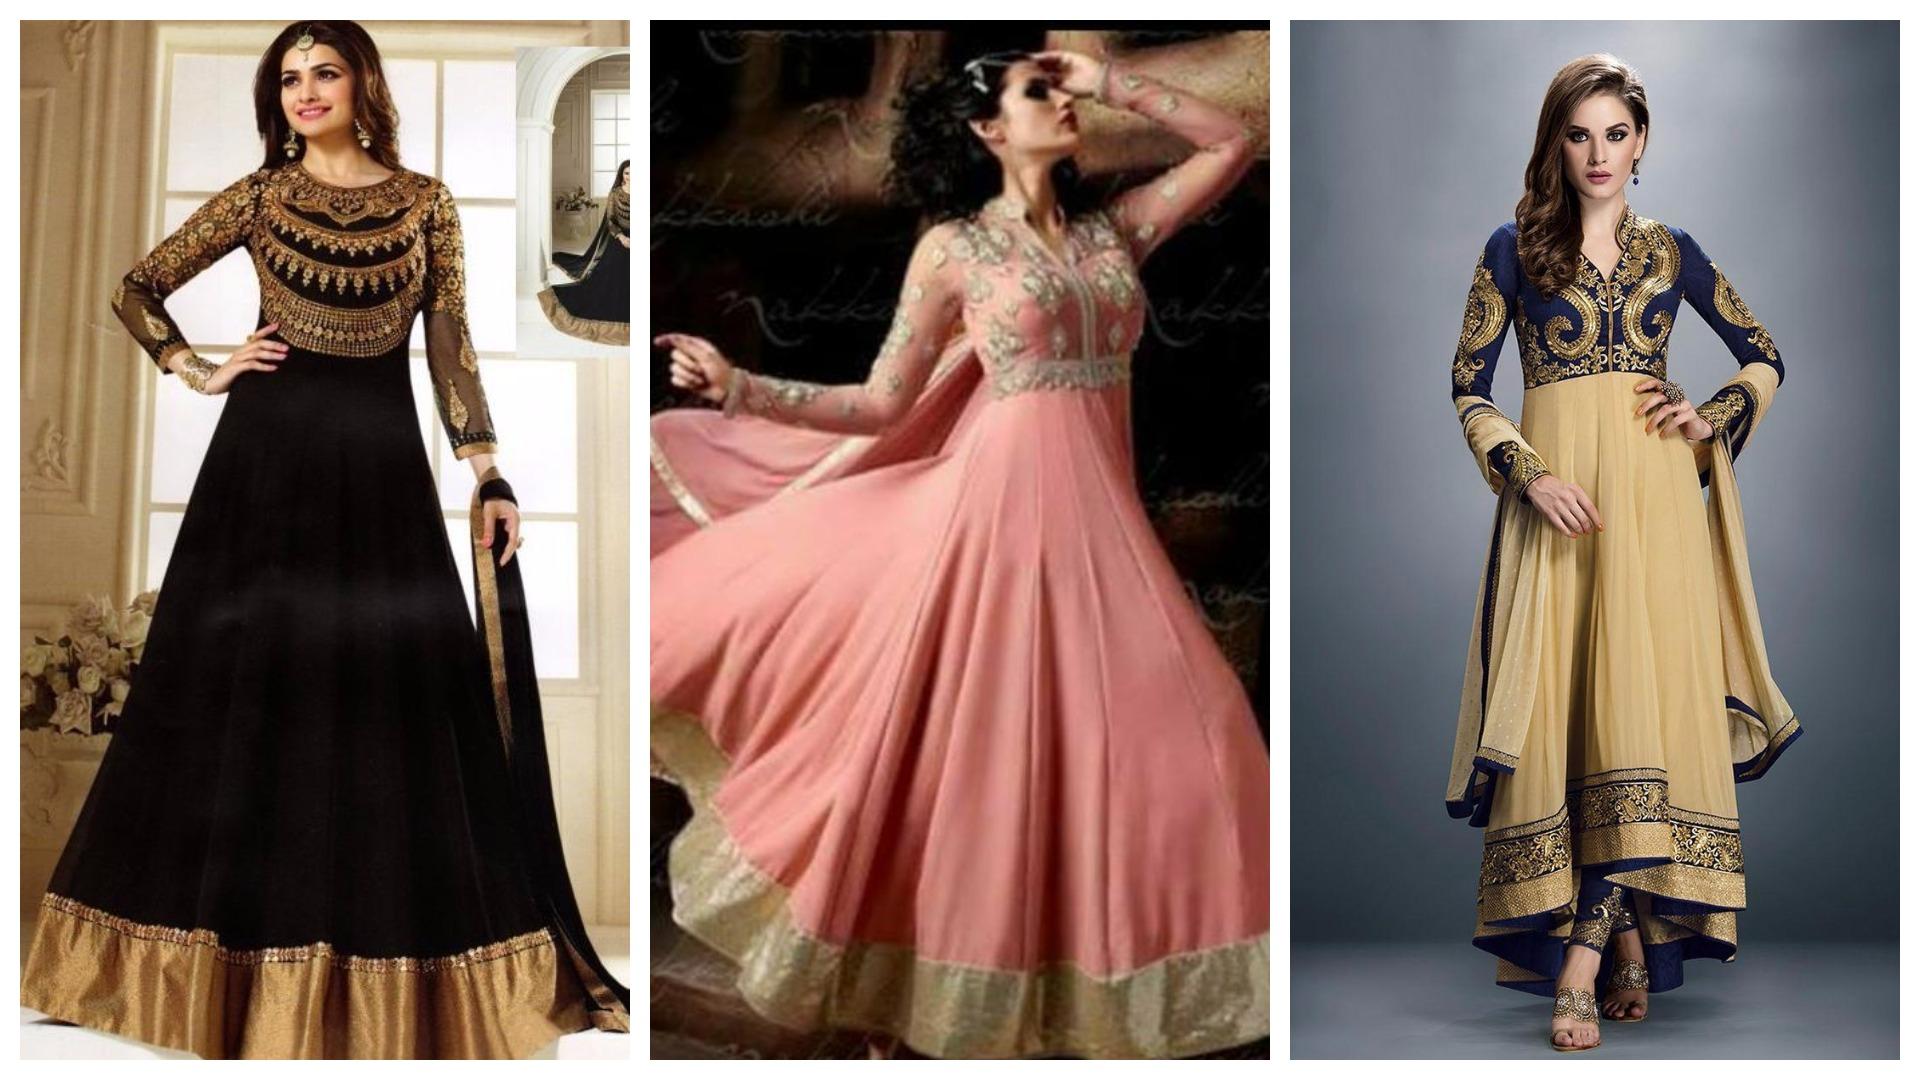 66101925c ازياء هندية , اجمل تصاميم ملابس هنديه - كيف